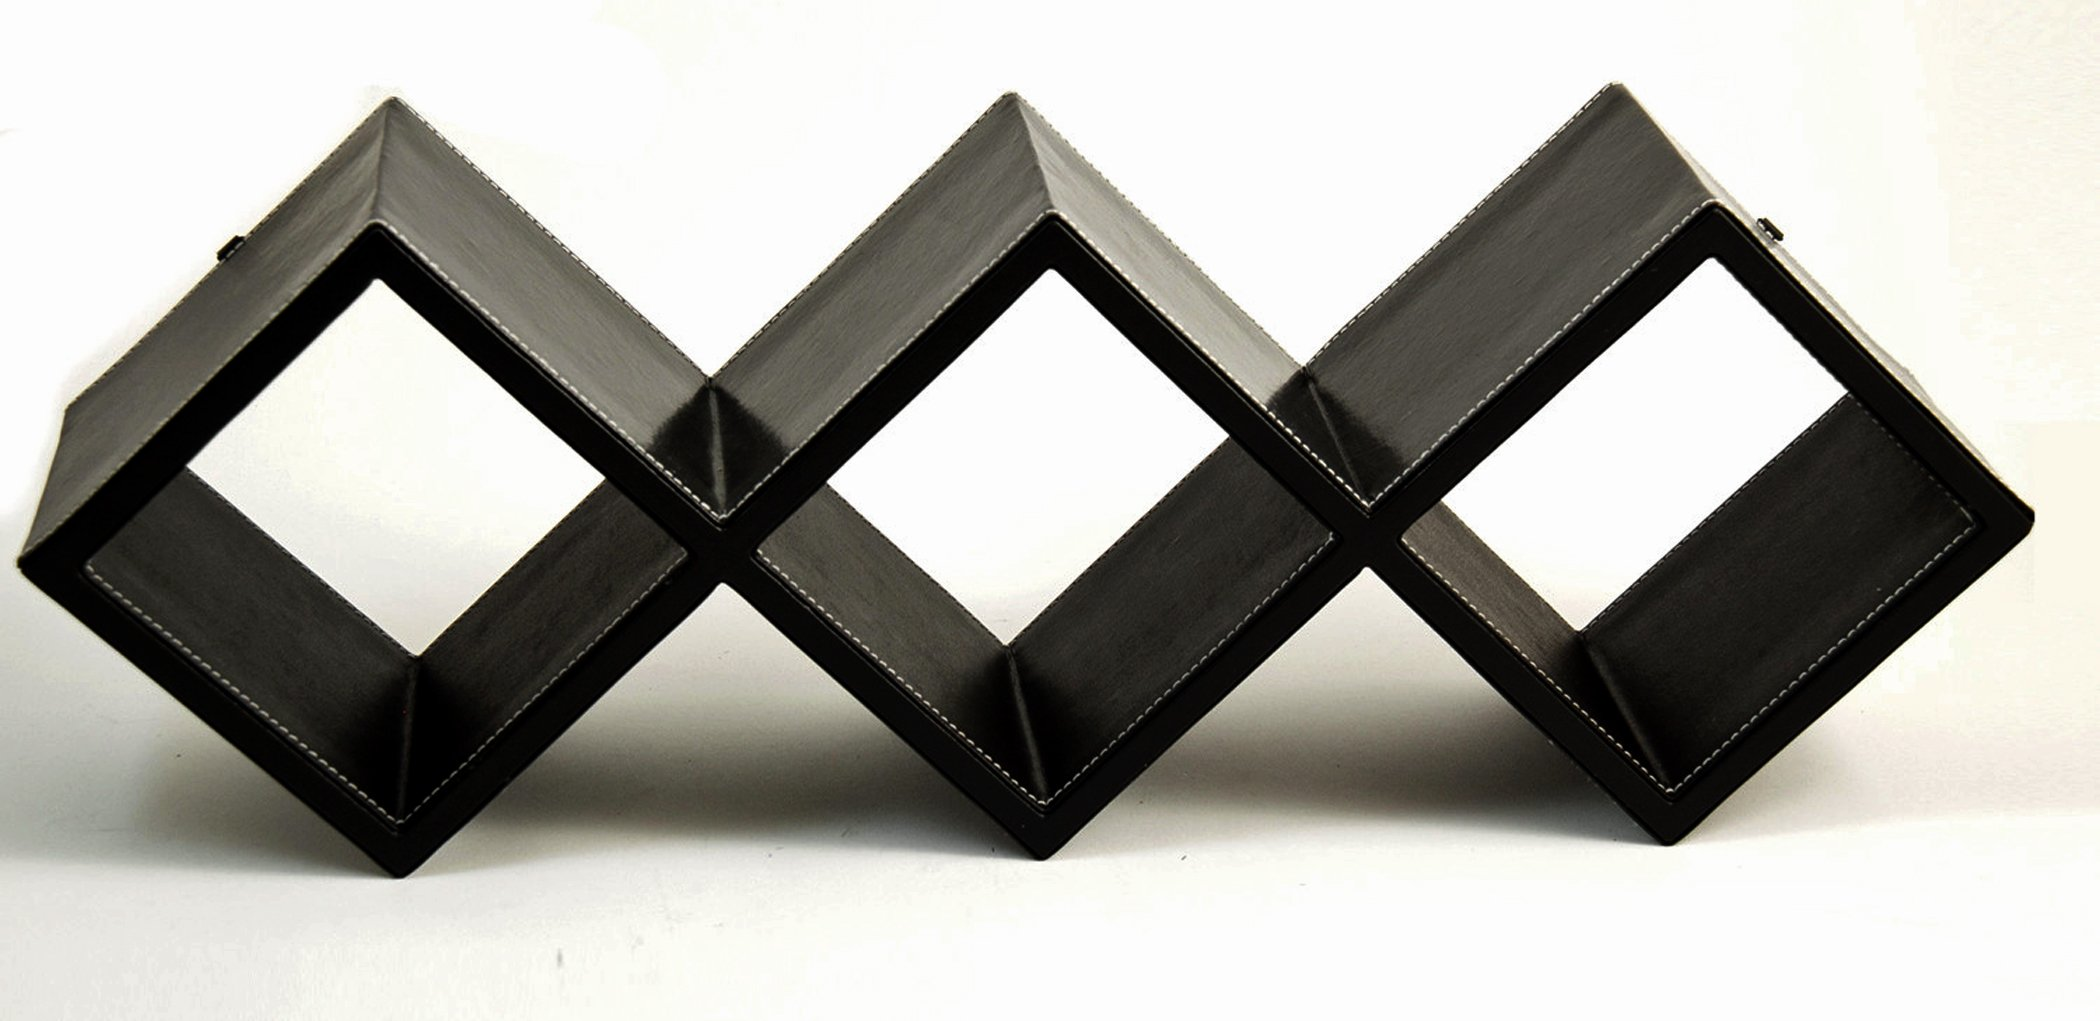 Storage Racks - Black Leather Storage Rack - CD Storage Rack - Wall Mounted or Desktop Storage Rack